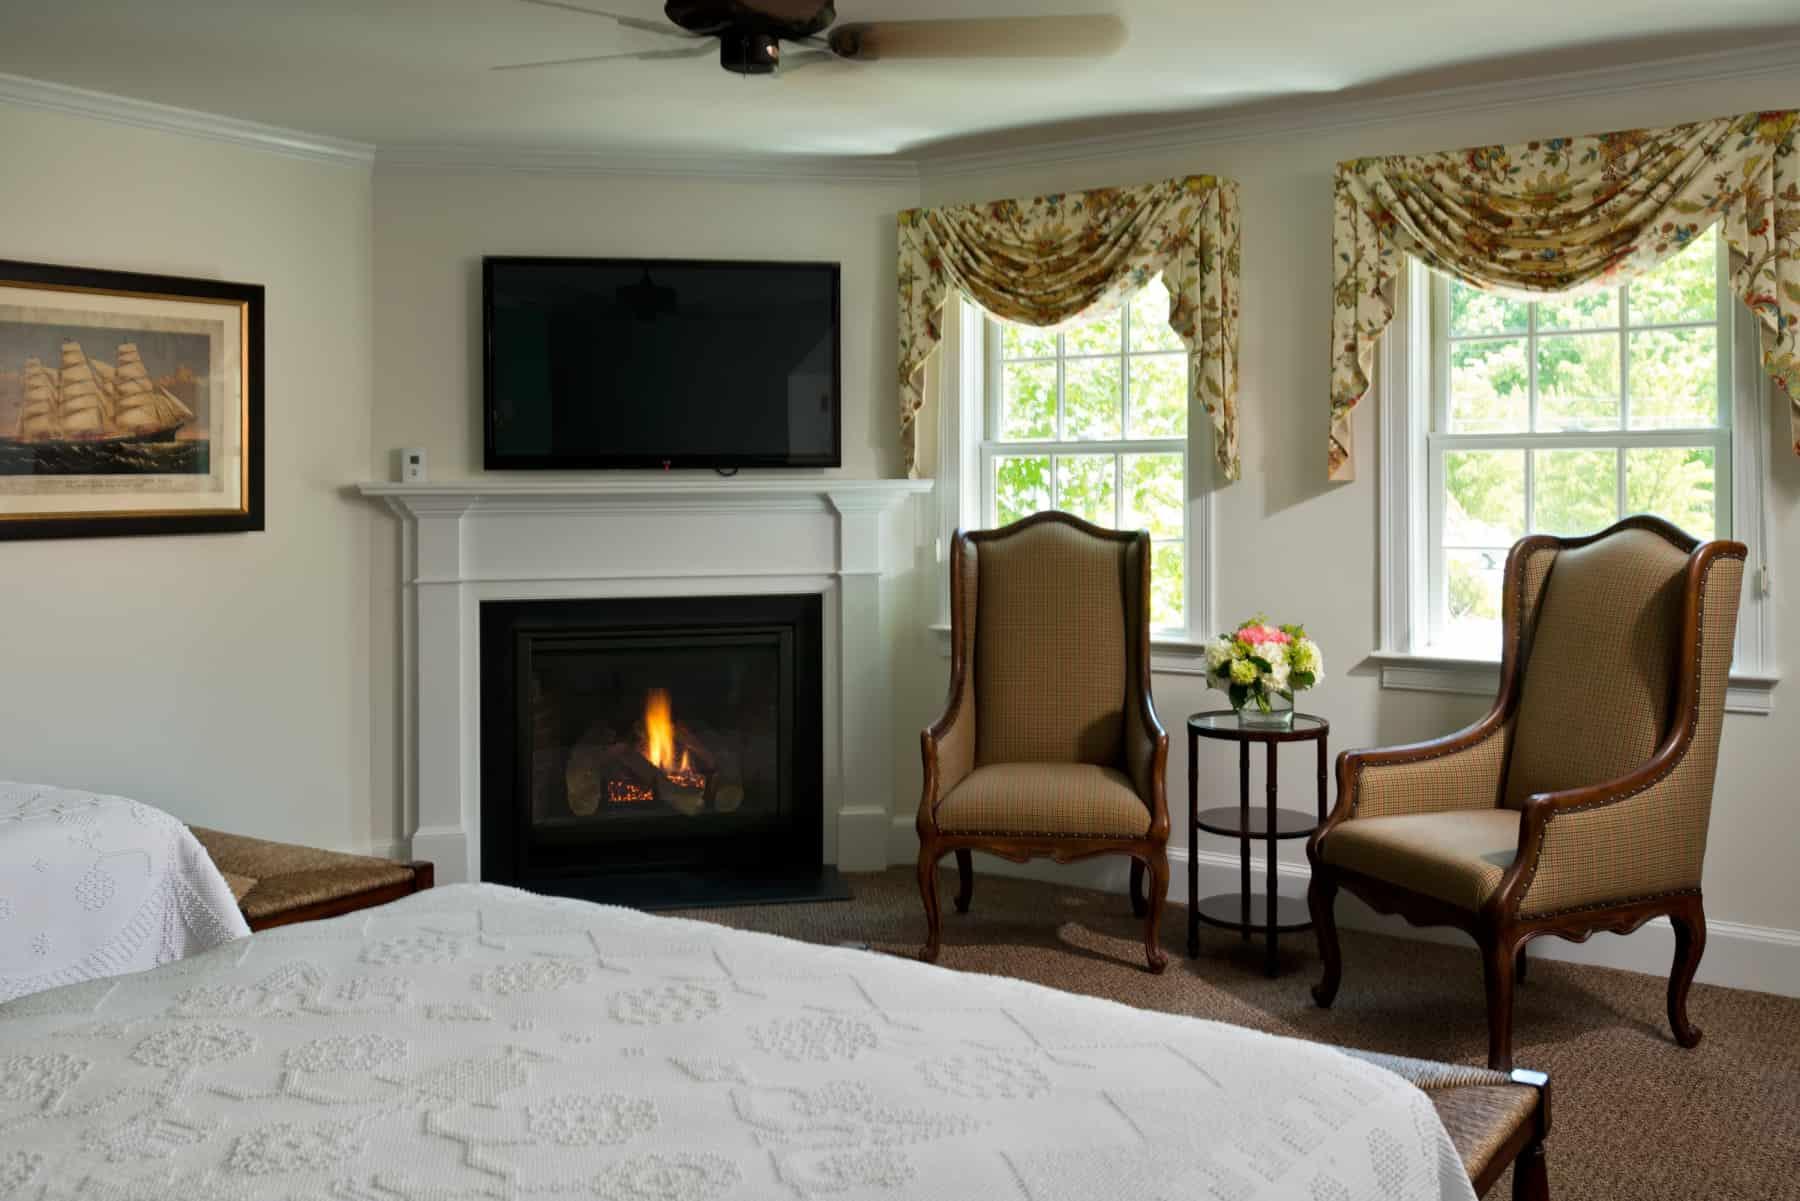 Leeward Stateroom TV and fireplace